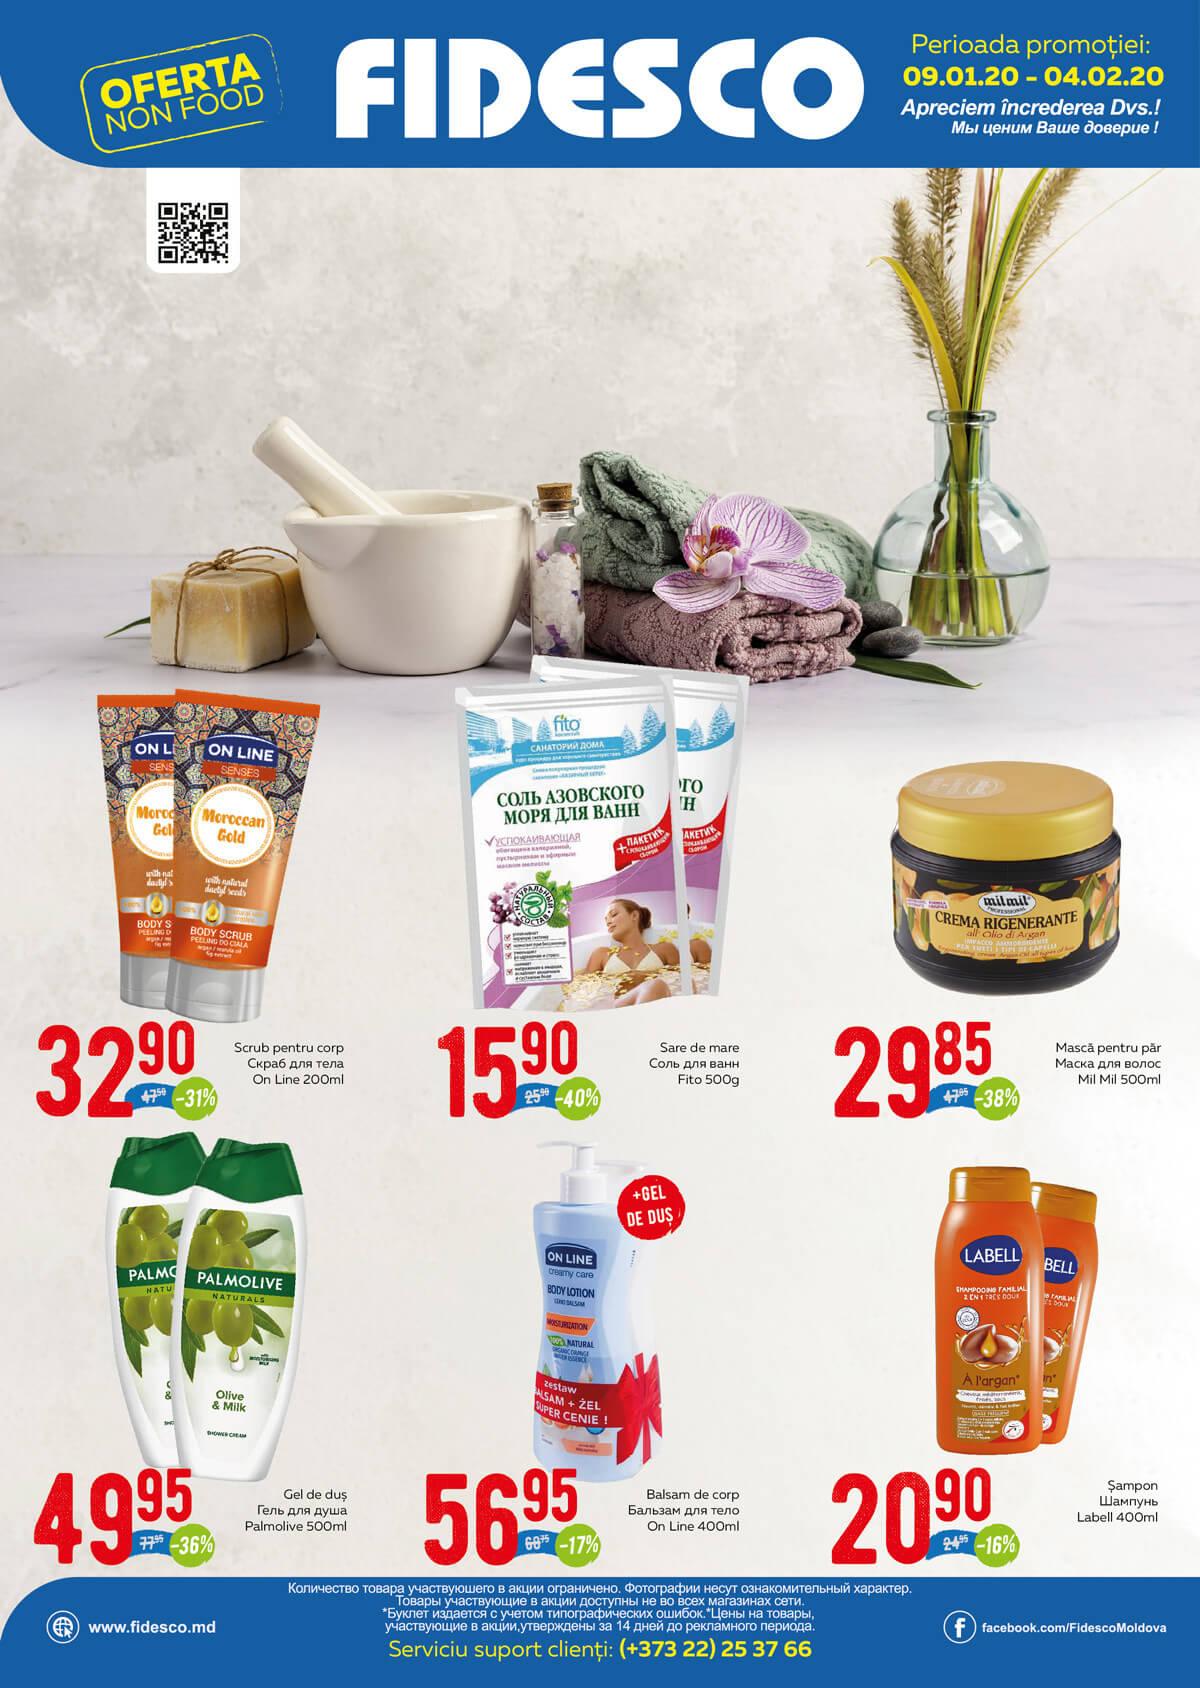 Fidesco - oferta nonfood ianuarie